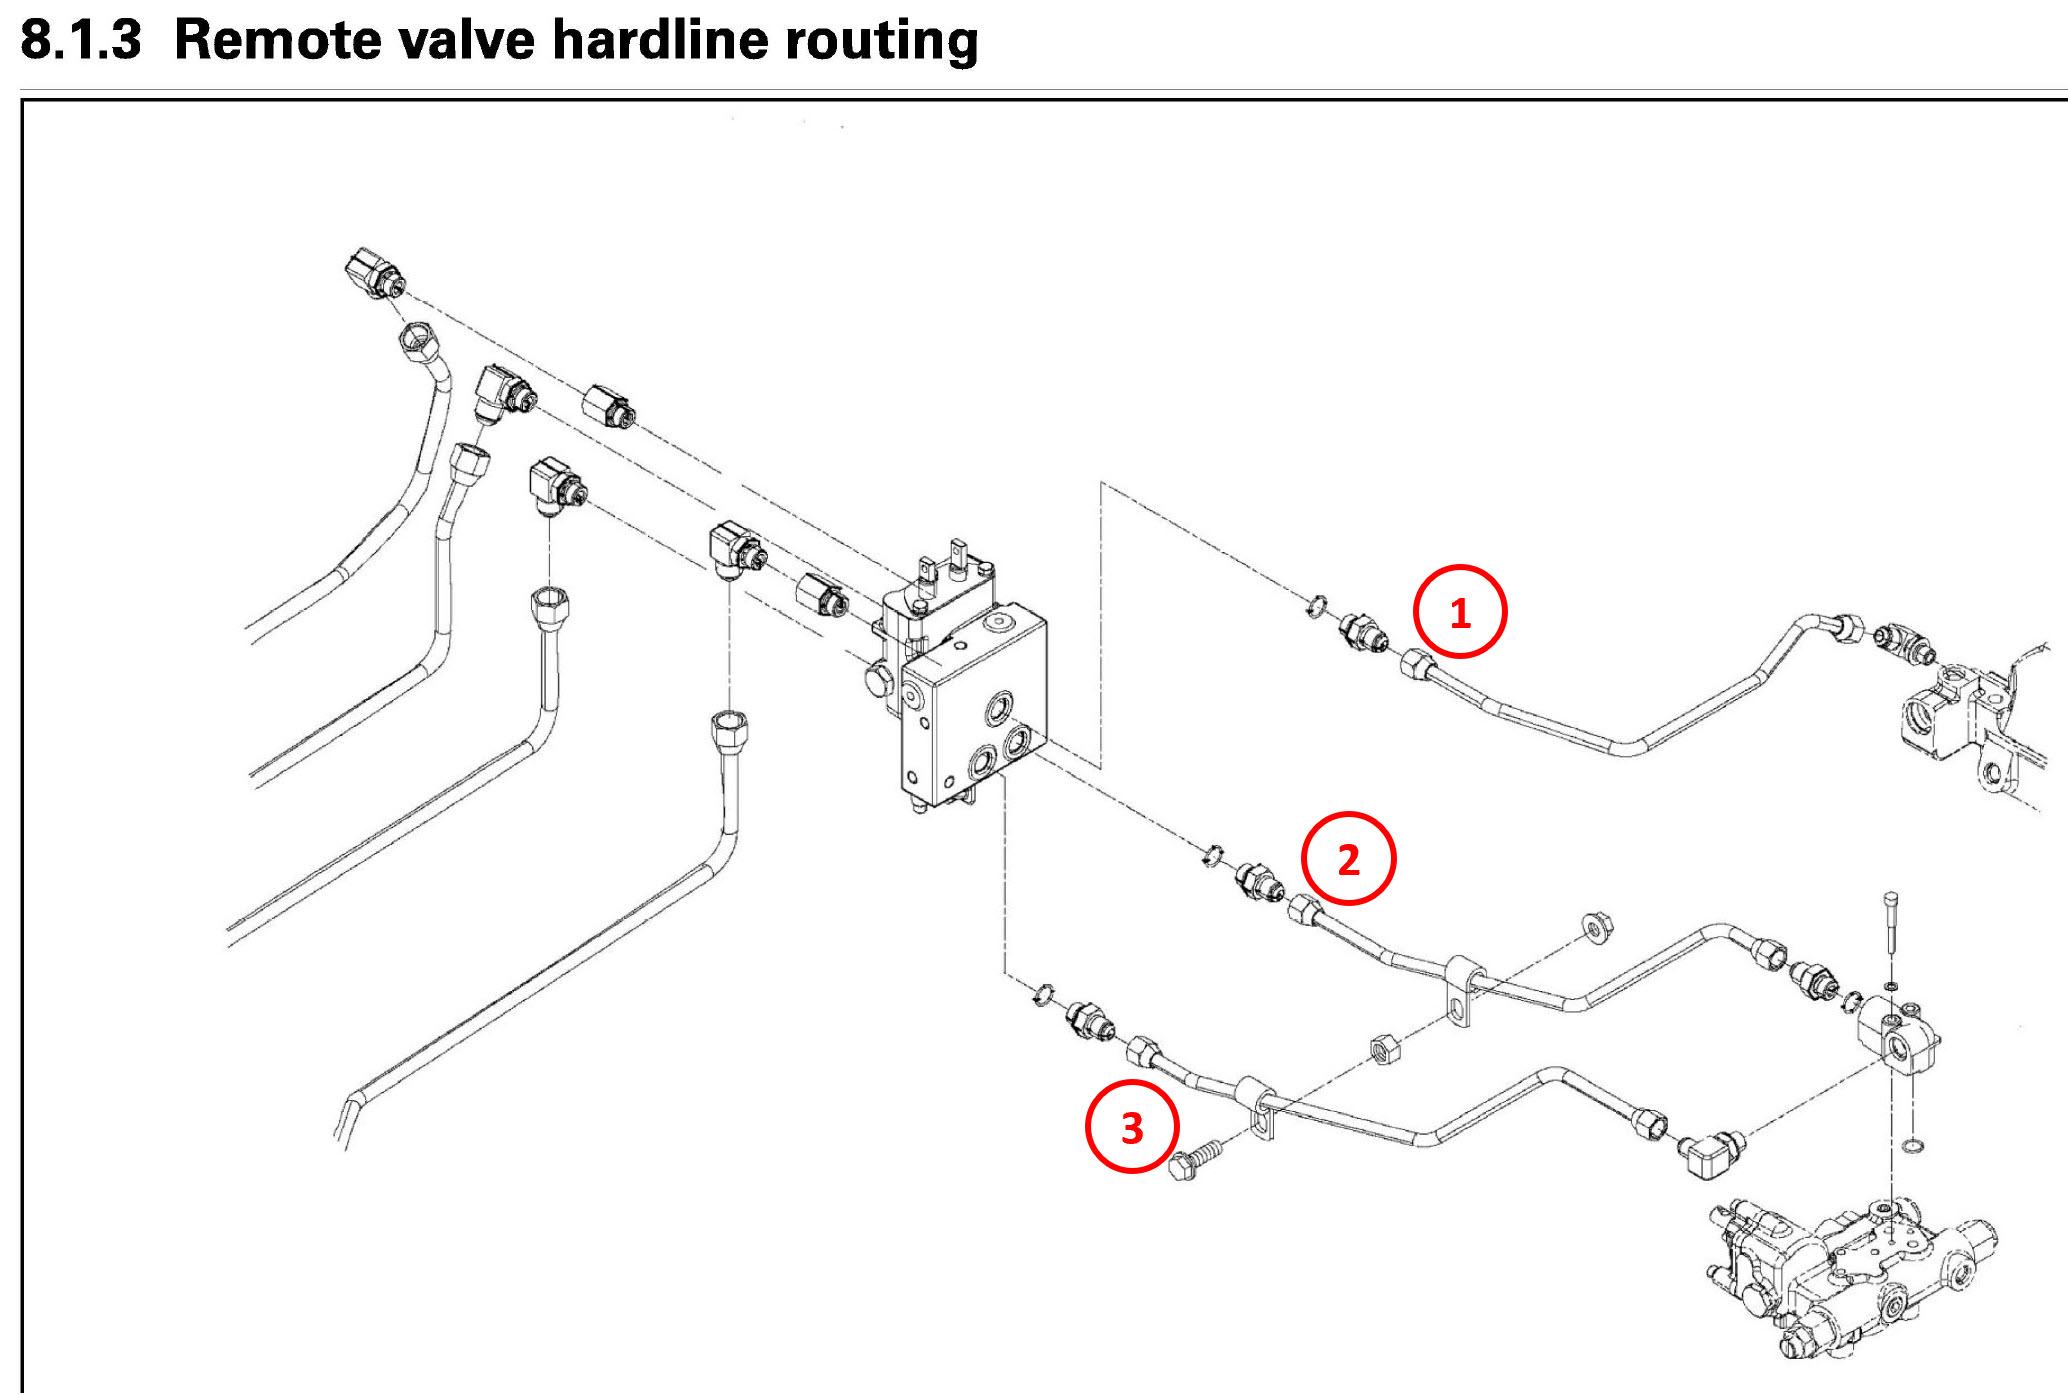 Remote Valve Hardline Routing - marked.jpg